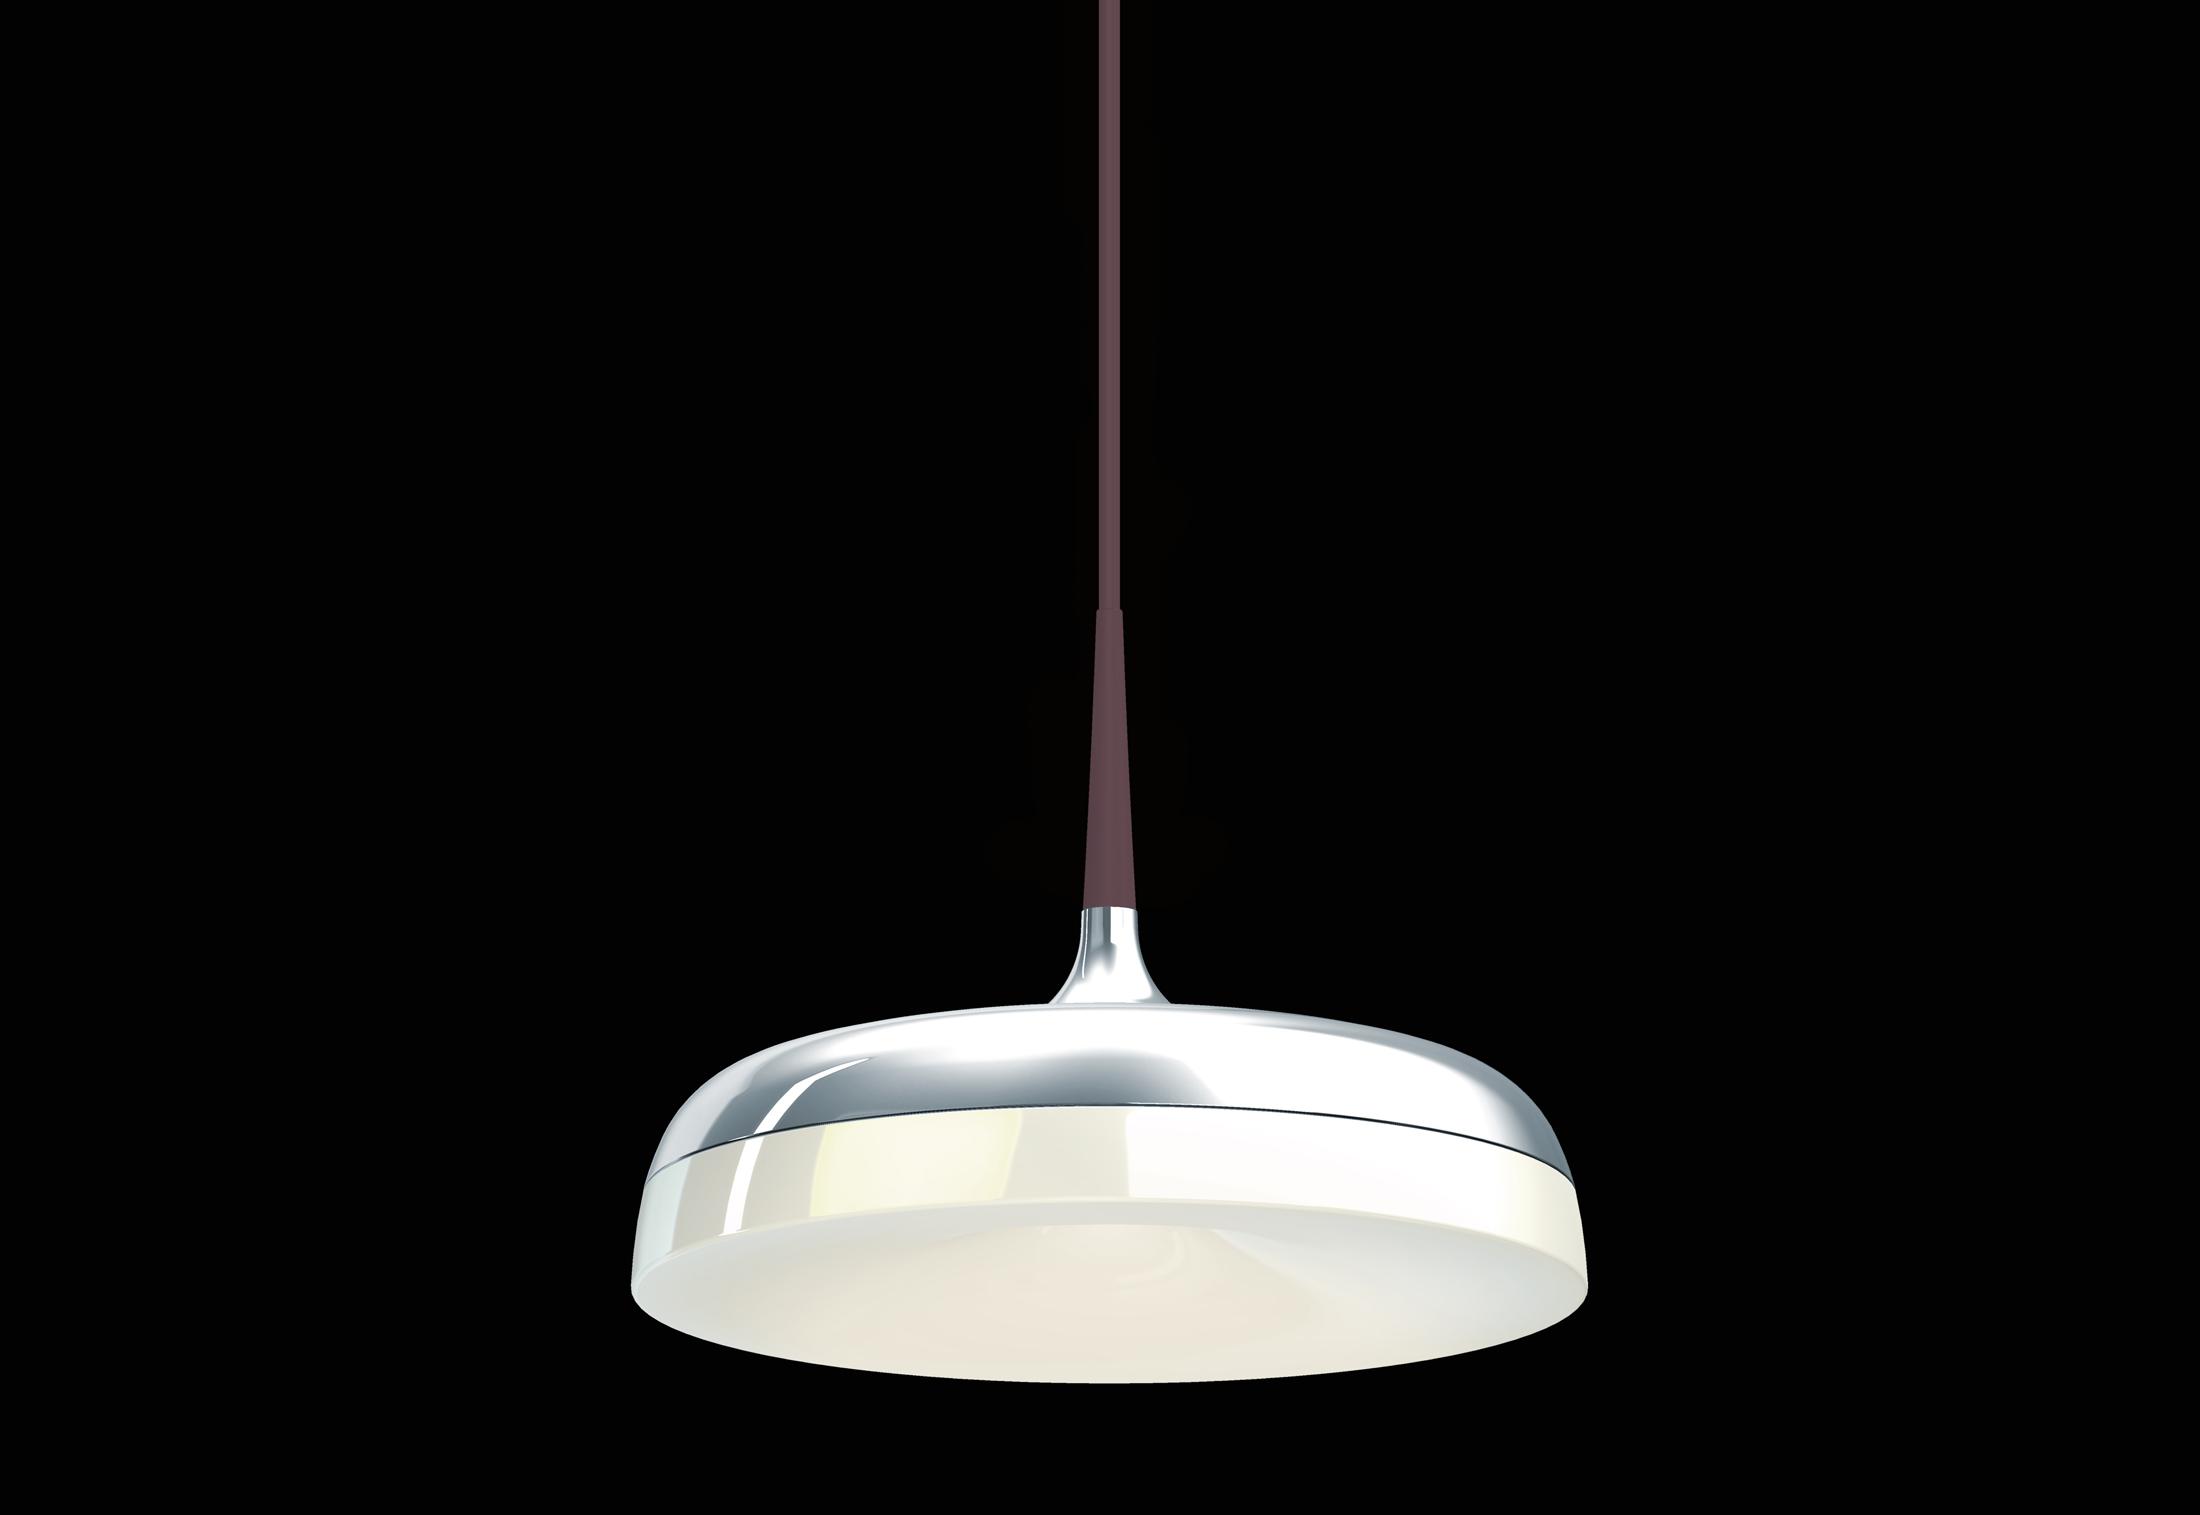 Paris Lamp by Tobias Grau